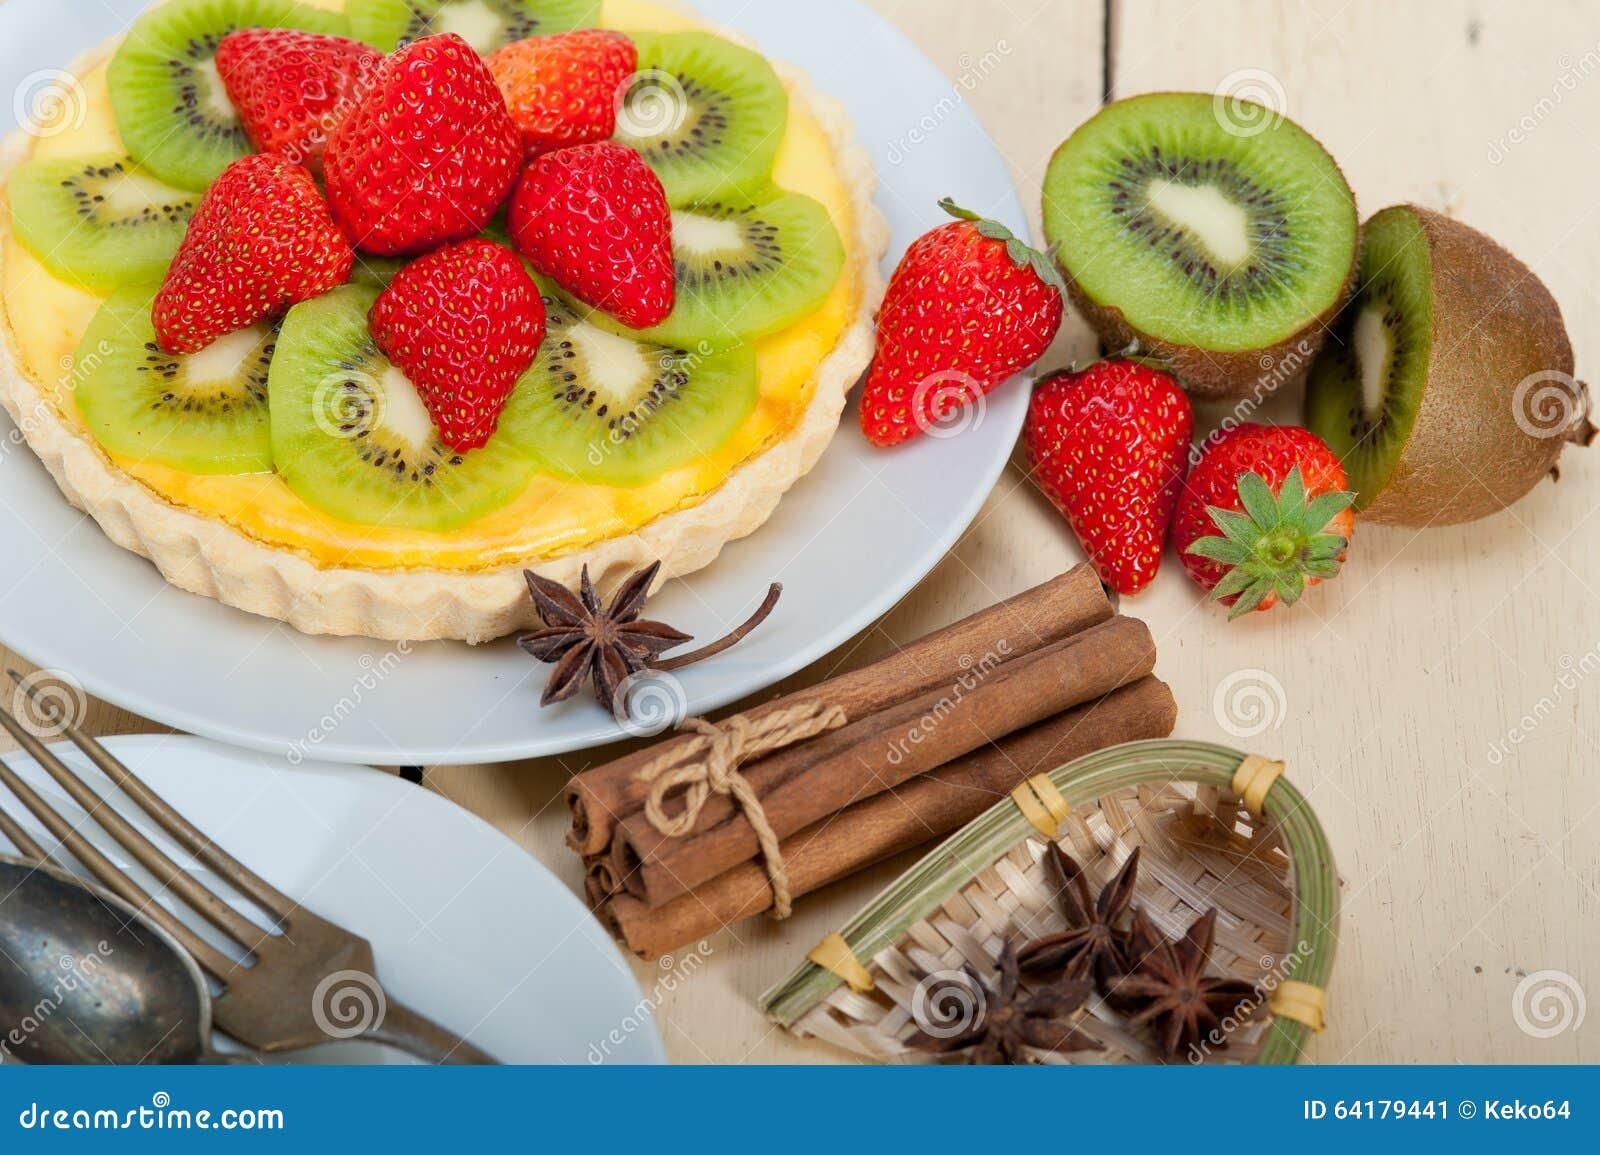 Kiwi And Strawberry Pie Tart Stock Photo - Image: 64179441